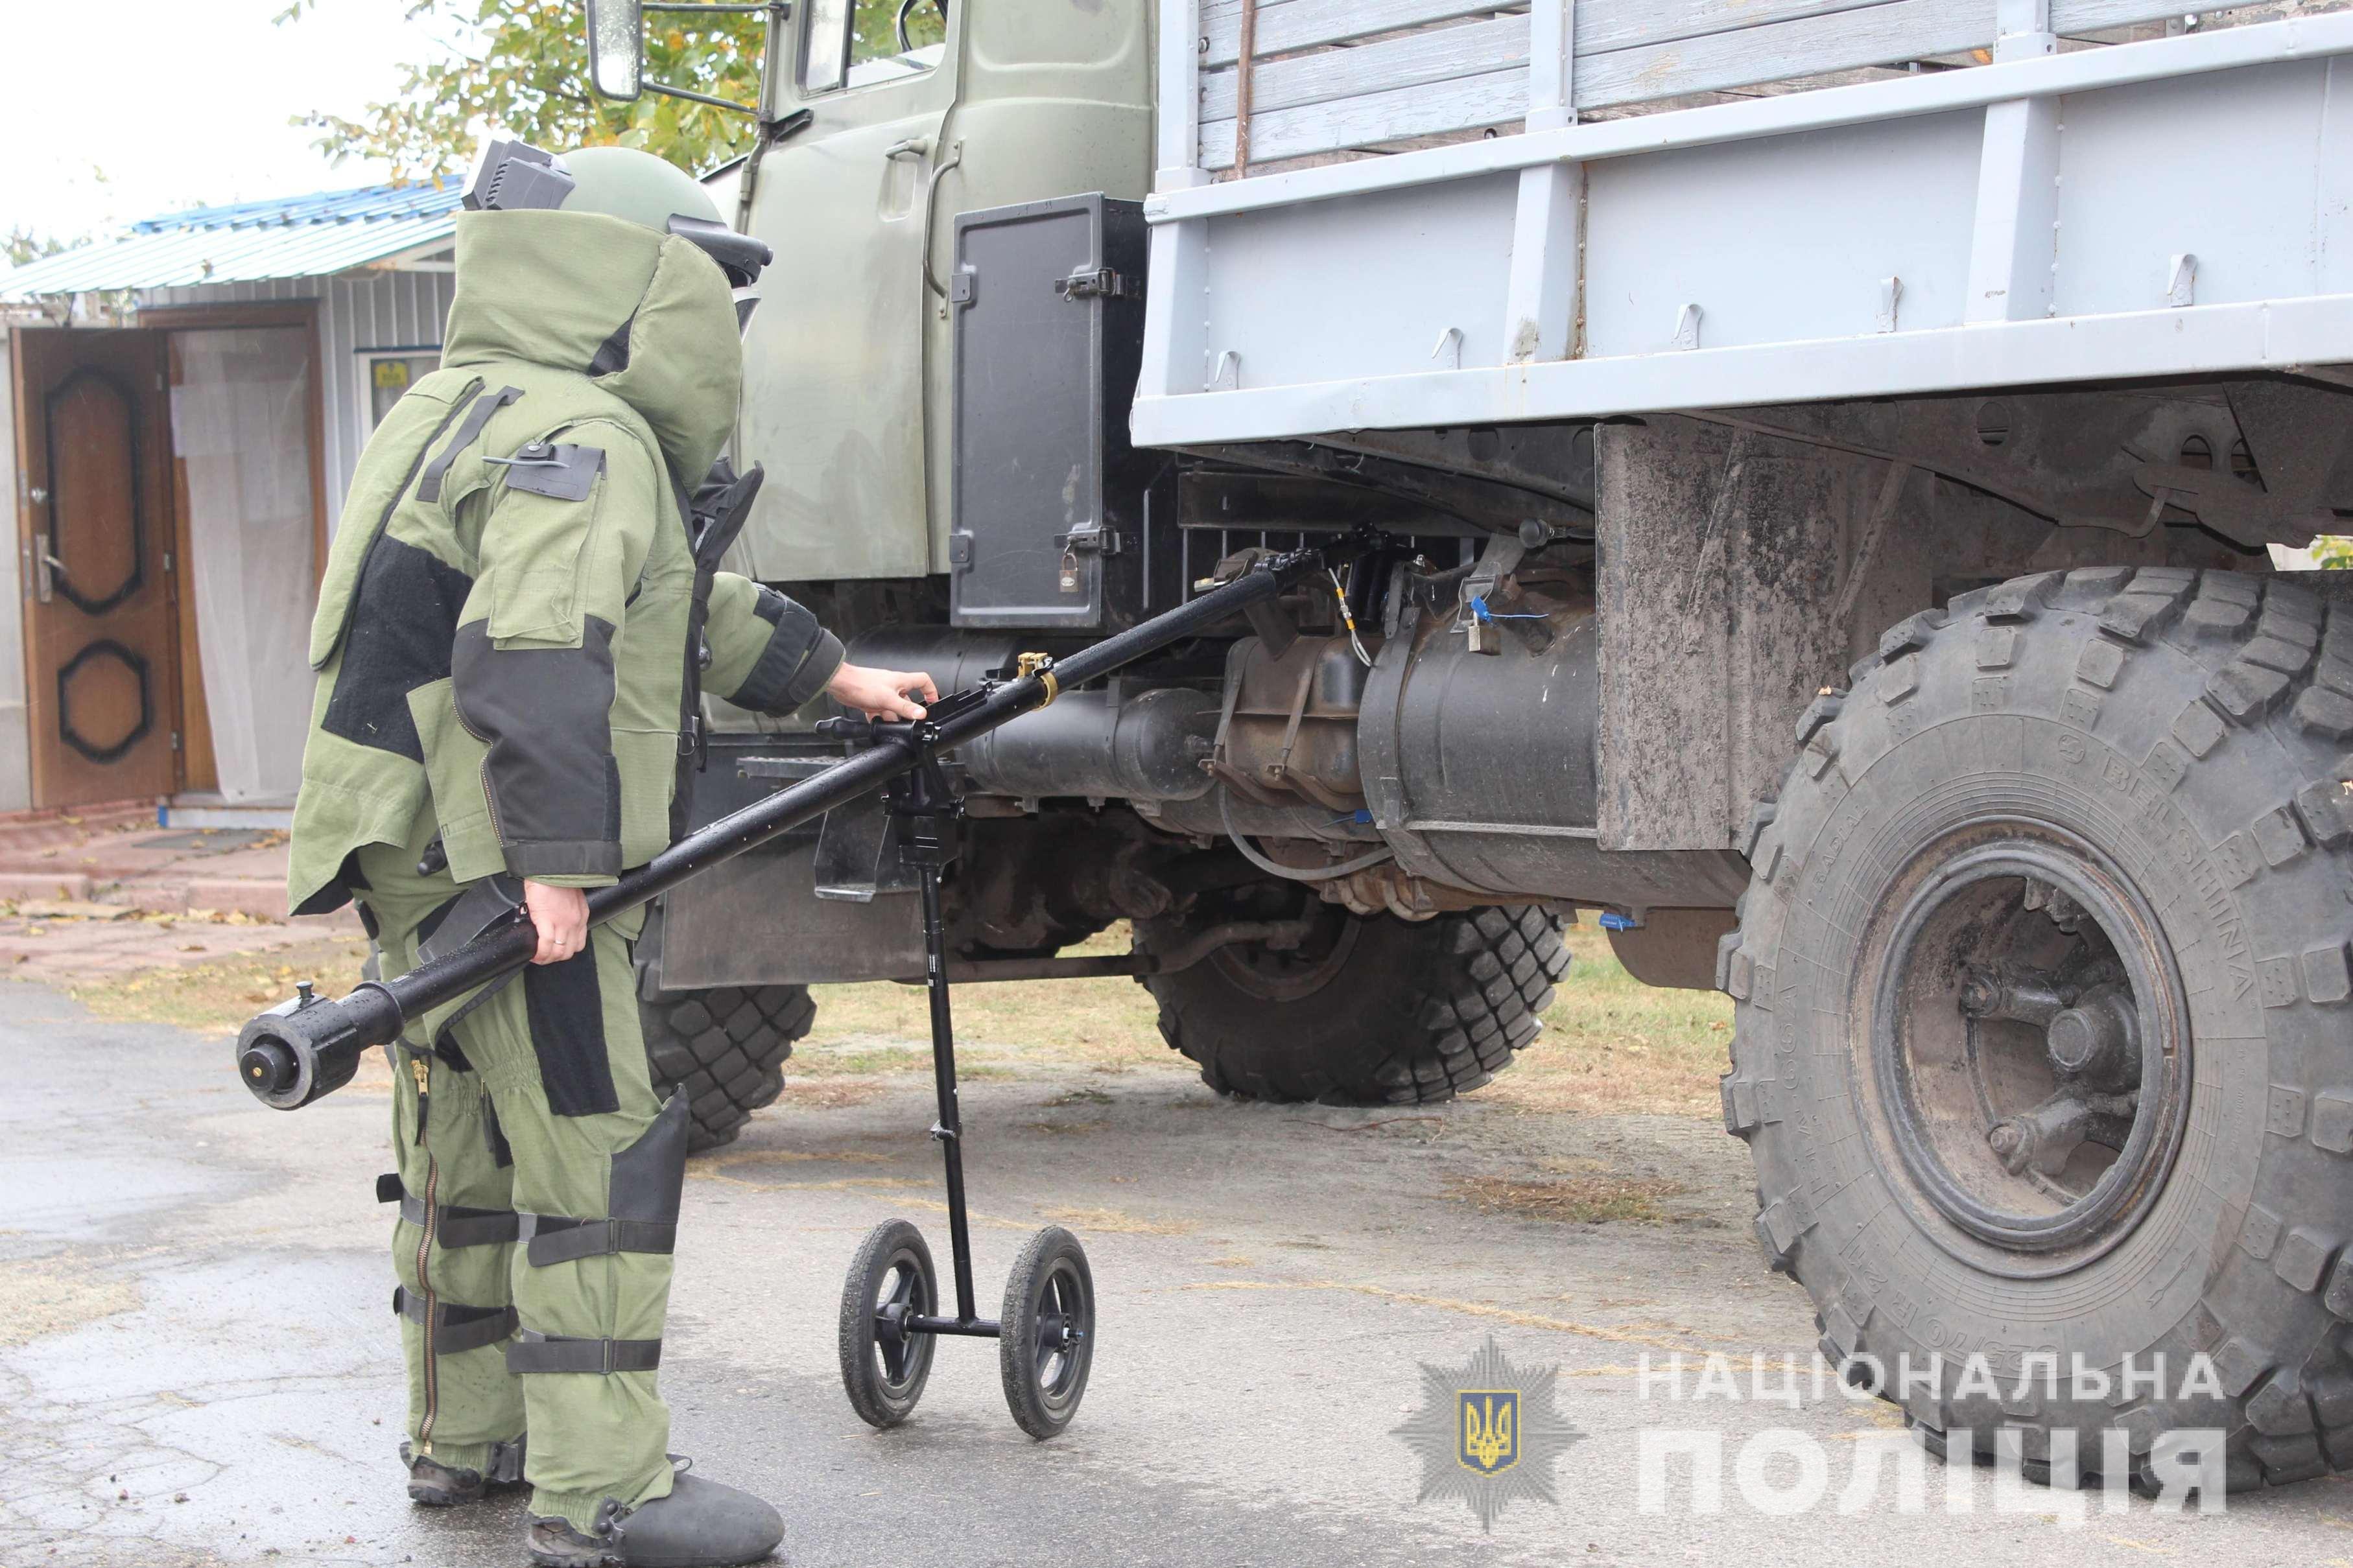 На земле, под землей и в небе: на Харьковщине прошли антитеррористические учения (видео, фото)